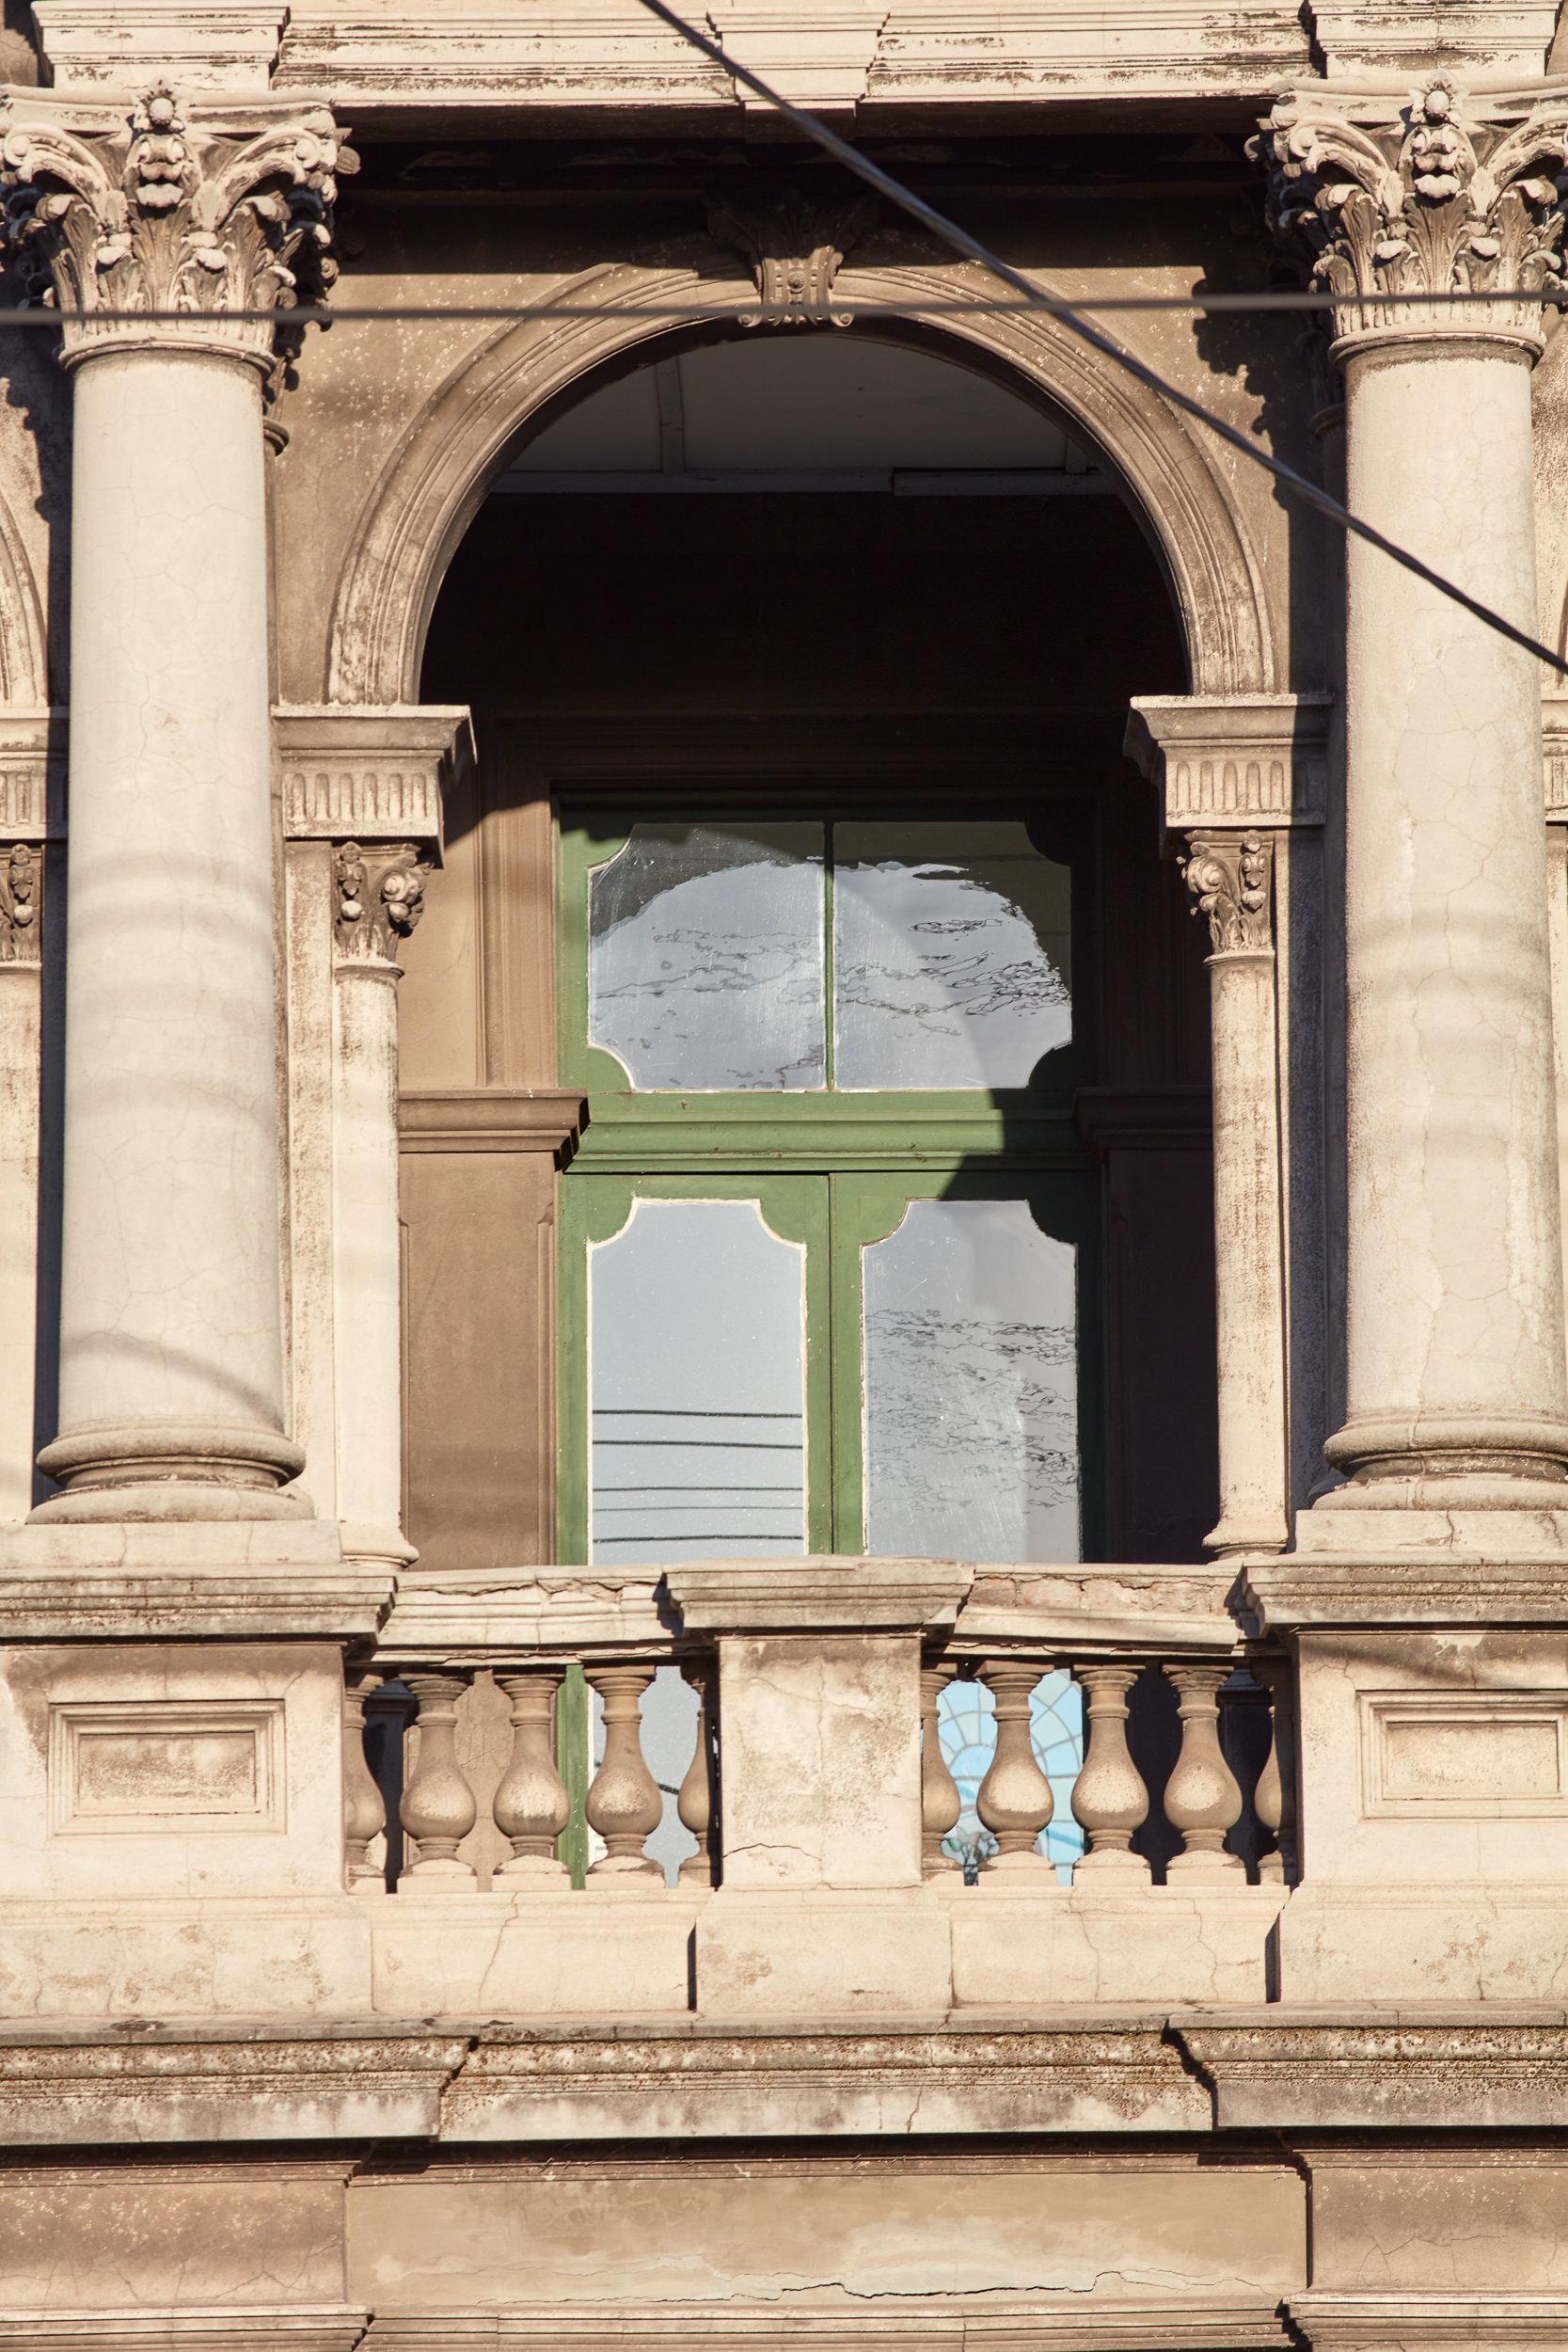 nathankdavis-nathan-k-davis-1nkd-architecture-architectural-photography-interior-exterior-design-real-estate-richmond-abinger-st-street-melbourne-3